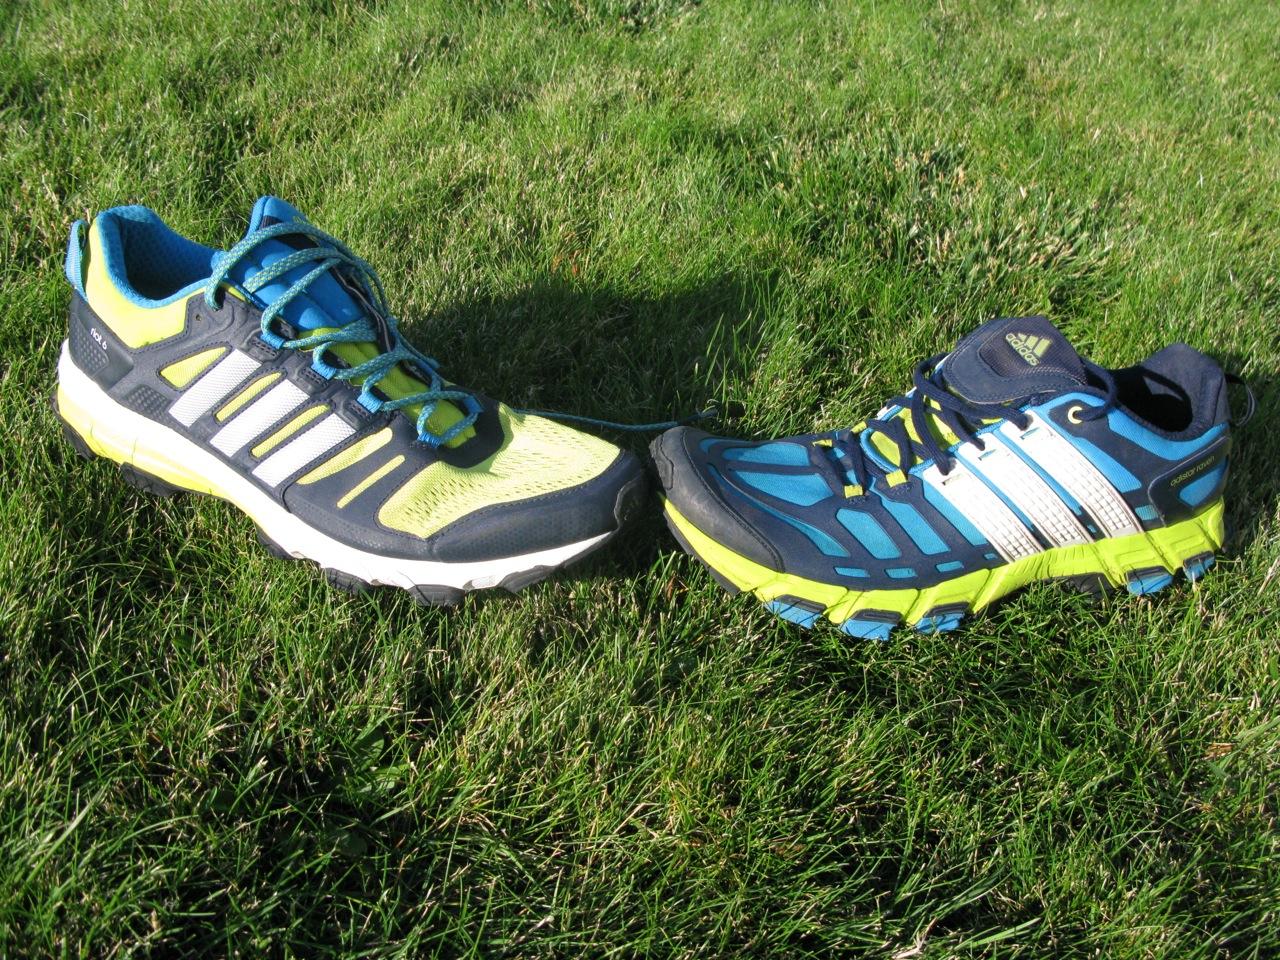 5b7d8d4c7 ... Trail Shoe Review adidas Supernova Riot 6 adidas Adistar Raven 3 Double  Review ...